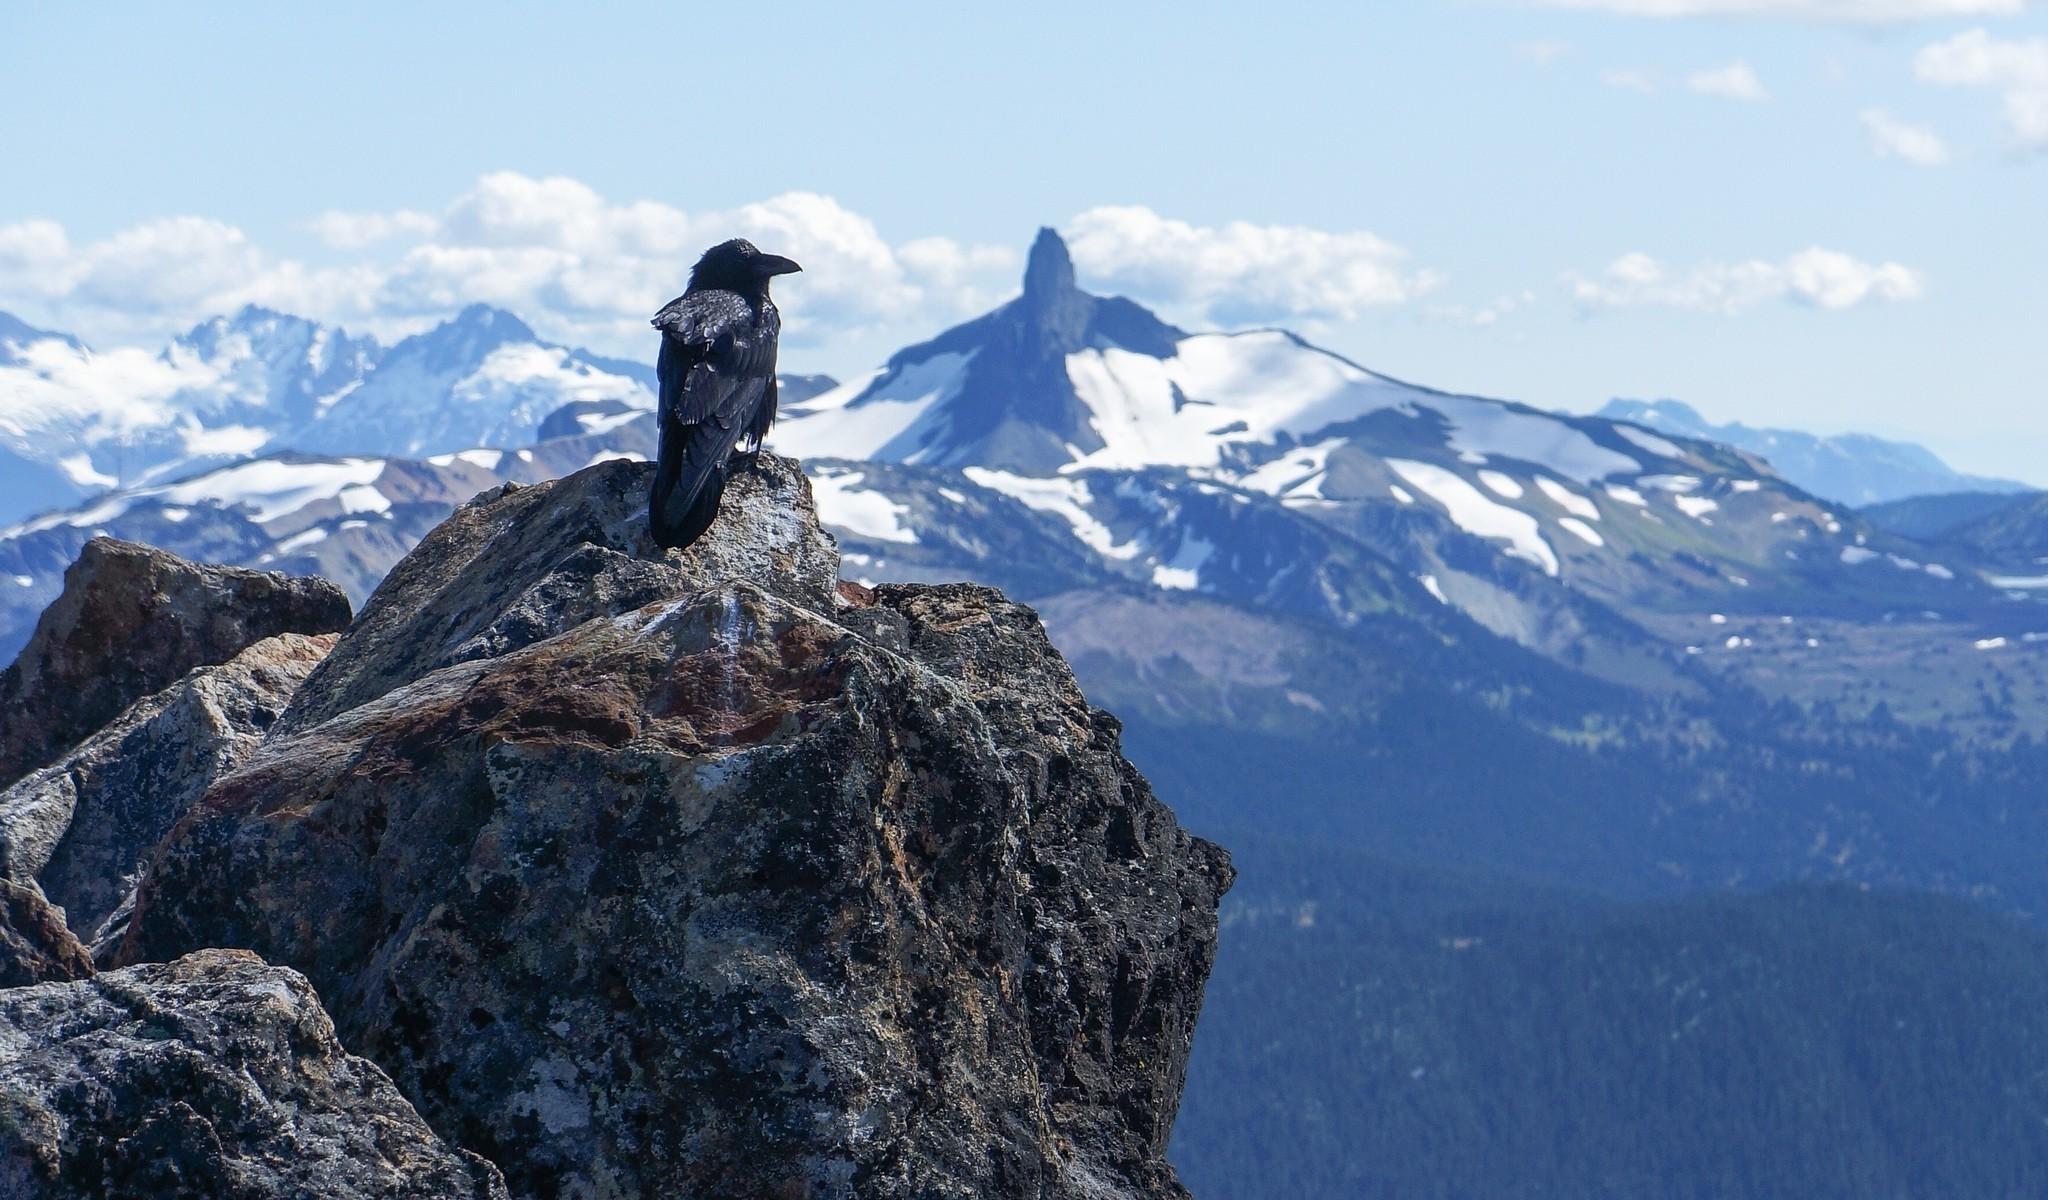 Fondo Escritorio Paisaje Nevada En Cumbre: Fondos De Pantalla : Paisaje, Aves, Animales, Nieve